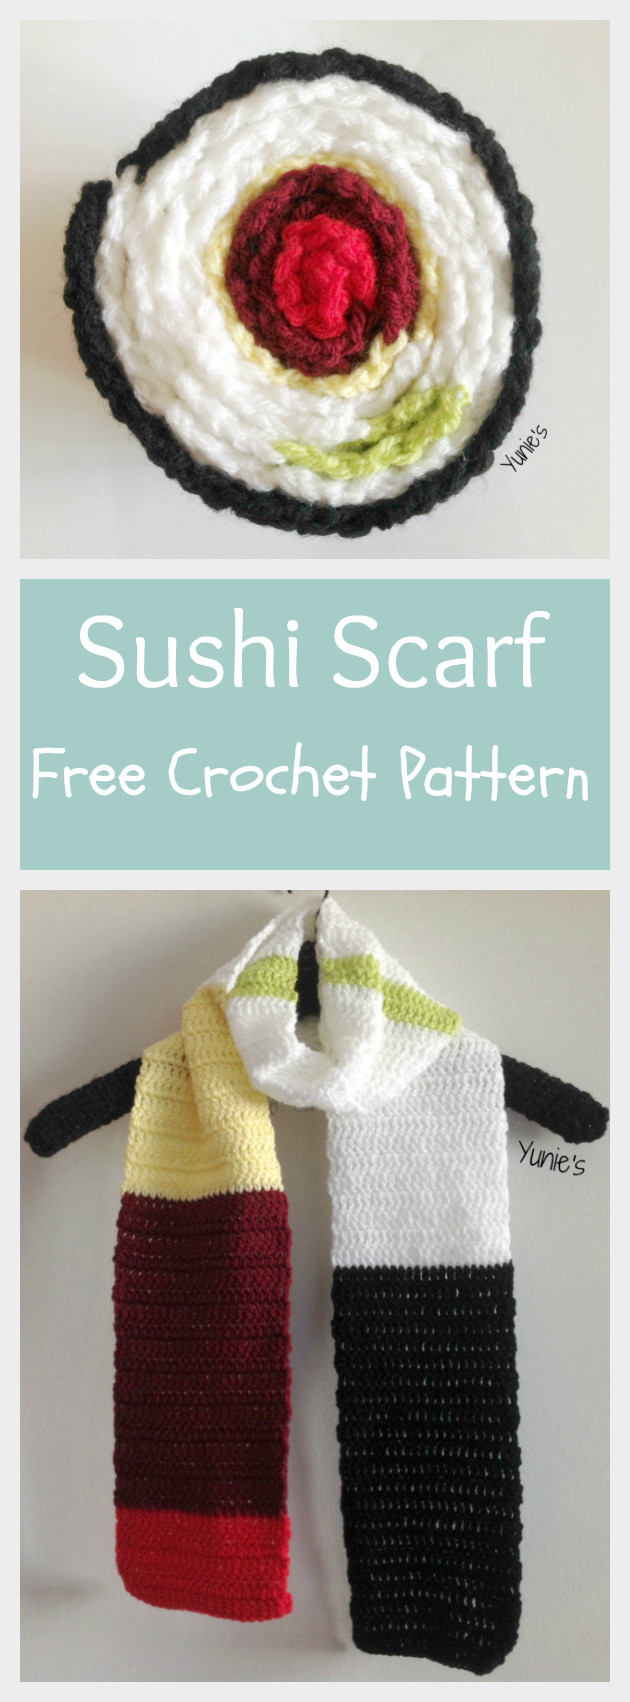 Sushi-Scarf-Free-Crochet-Pattern